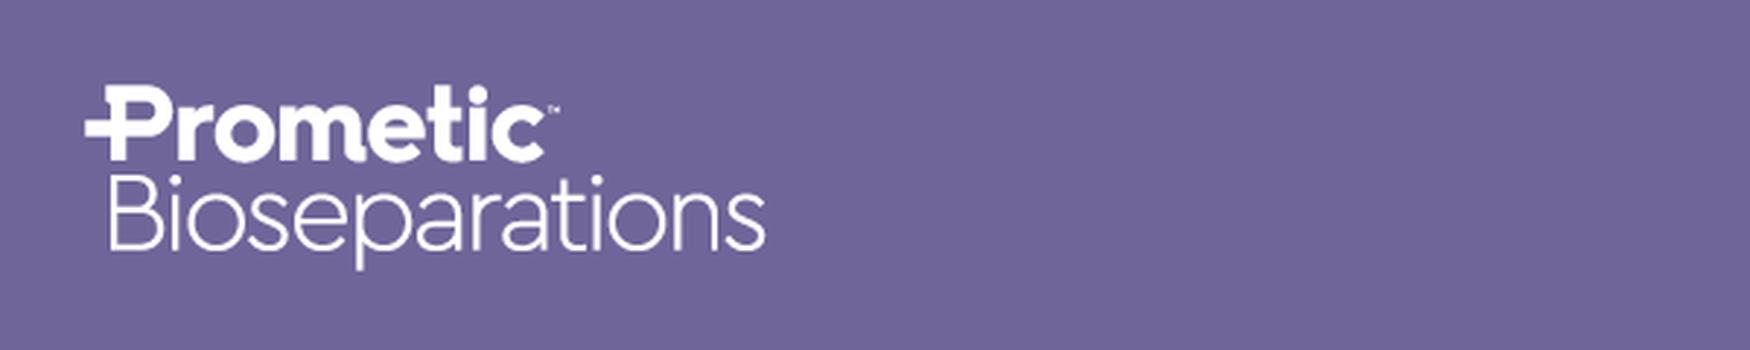 Prometic Bioseparations Ltd. logo